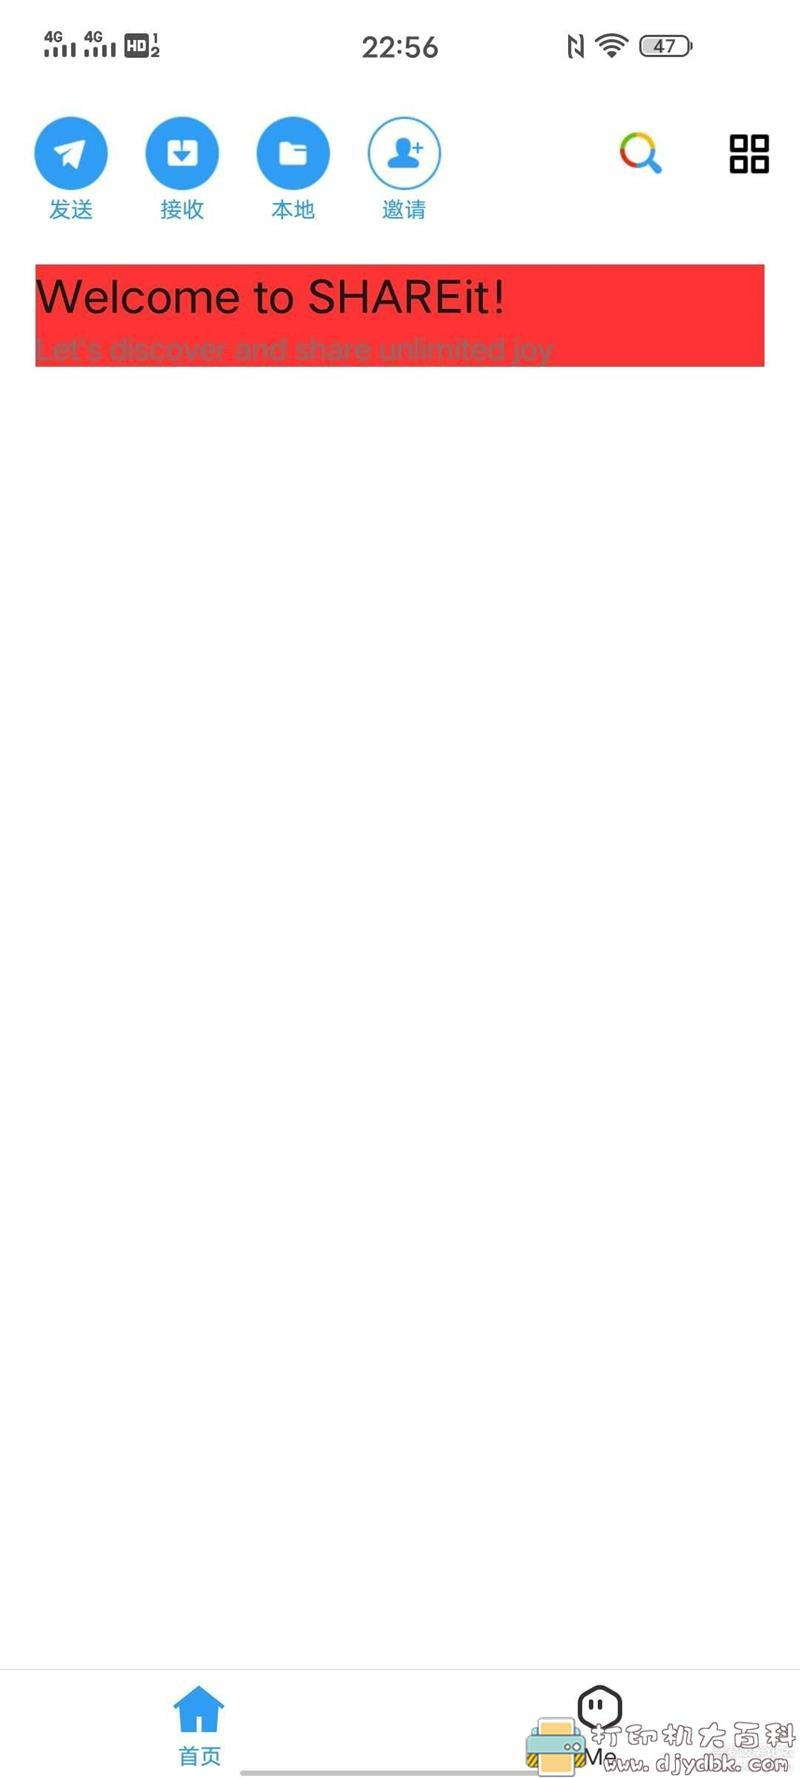 [Android]文件传输工具 SHAREit 共享v5.6.32 配图 No.3